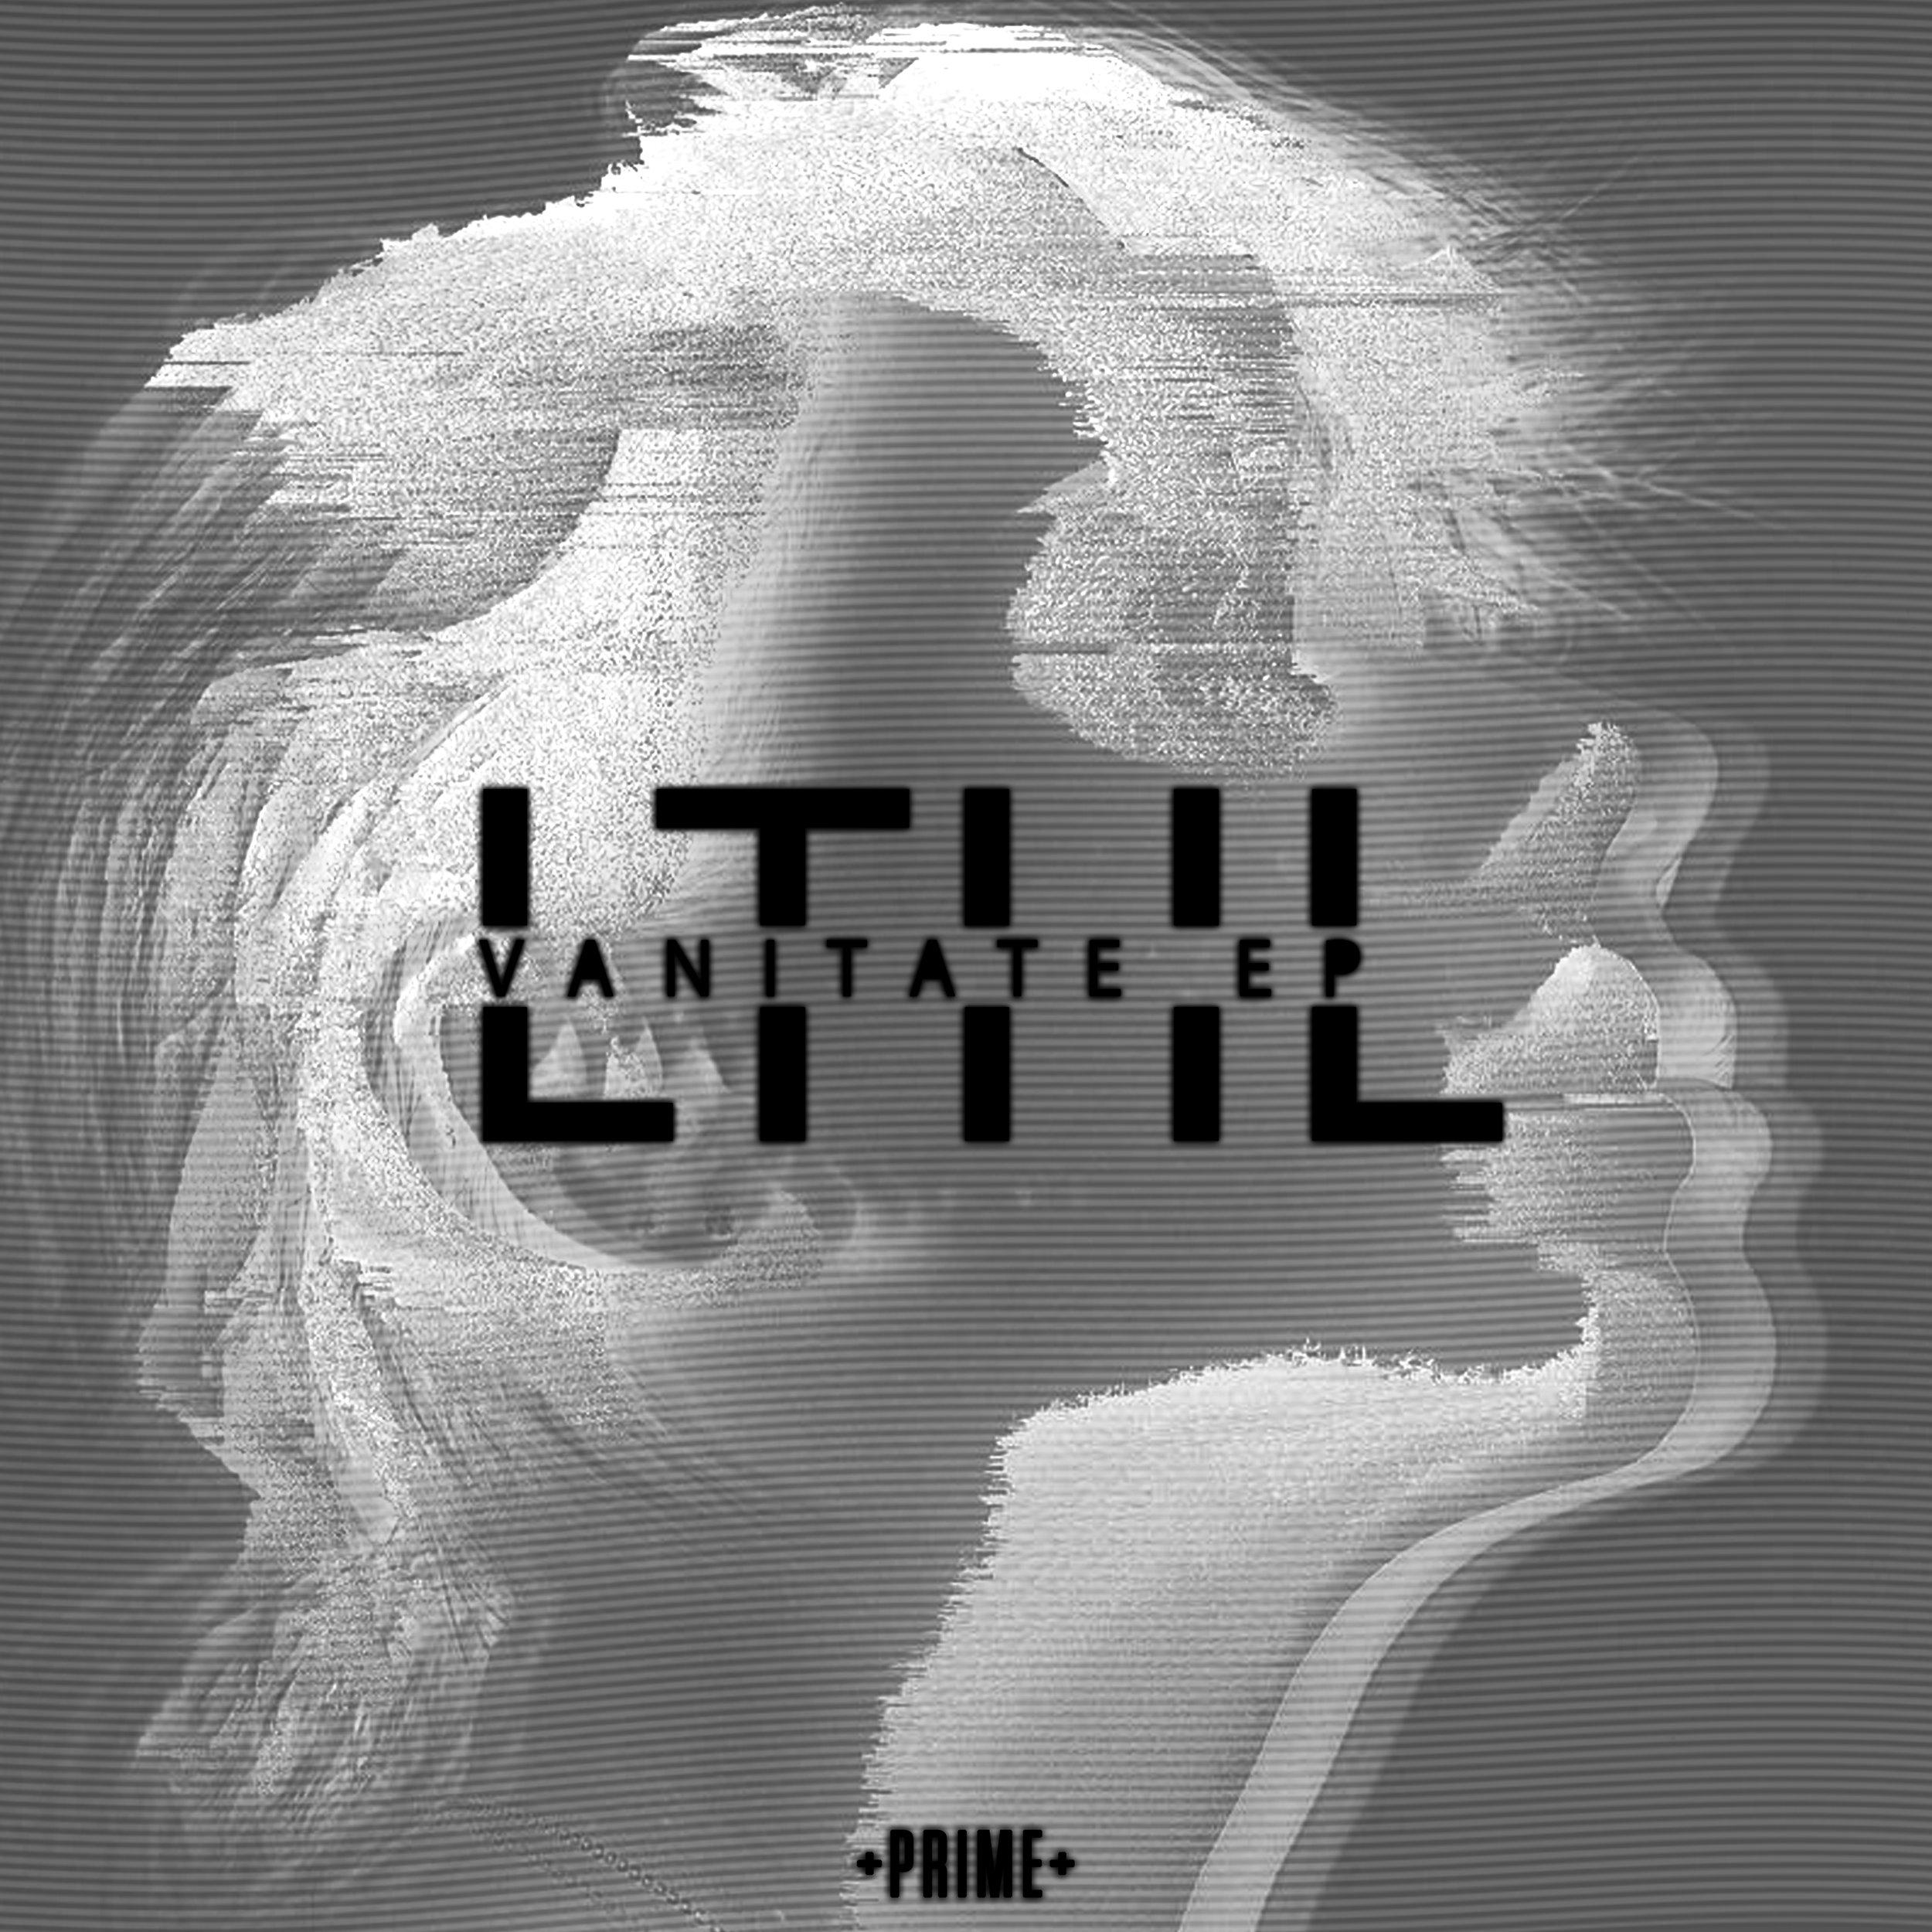 LTHL-Vanitate-EP-artwork.jpg